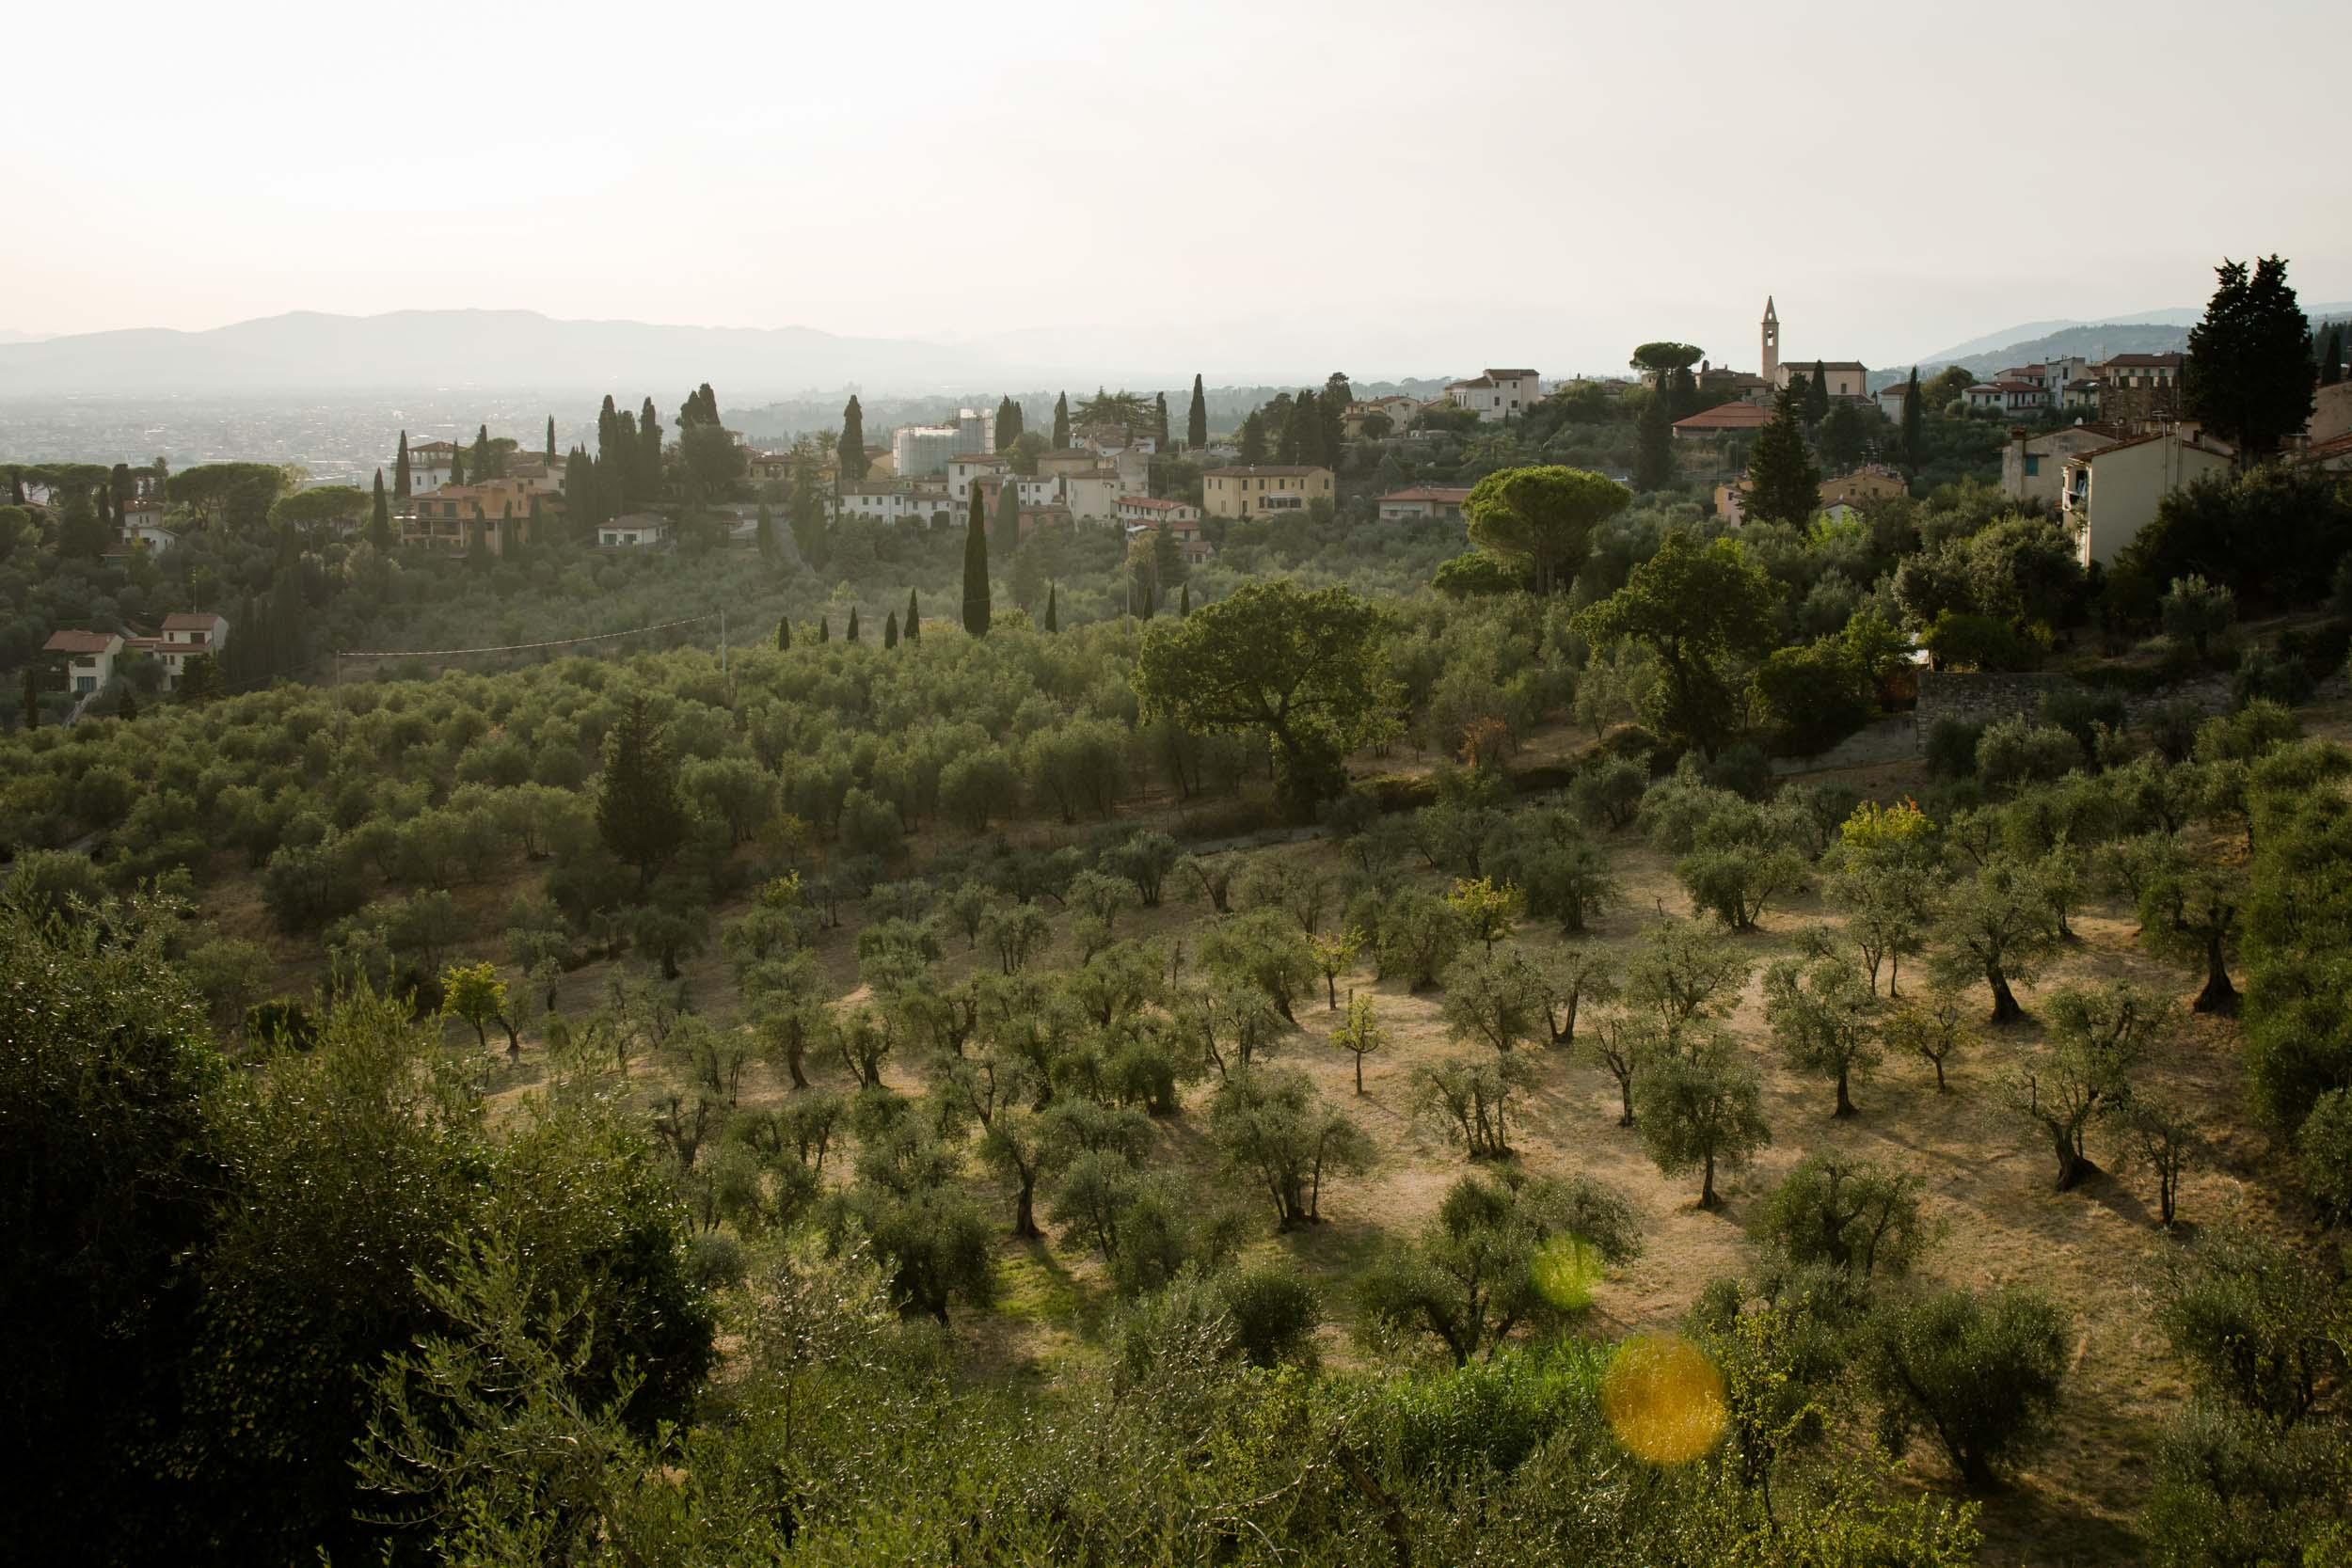 villa-gamberaia-florence-italy-destination-wedding-60.jpg